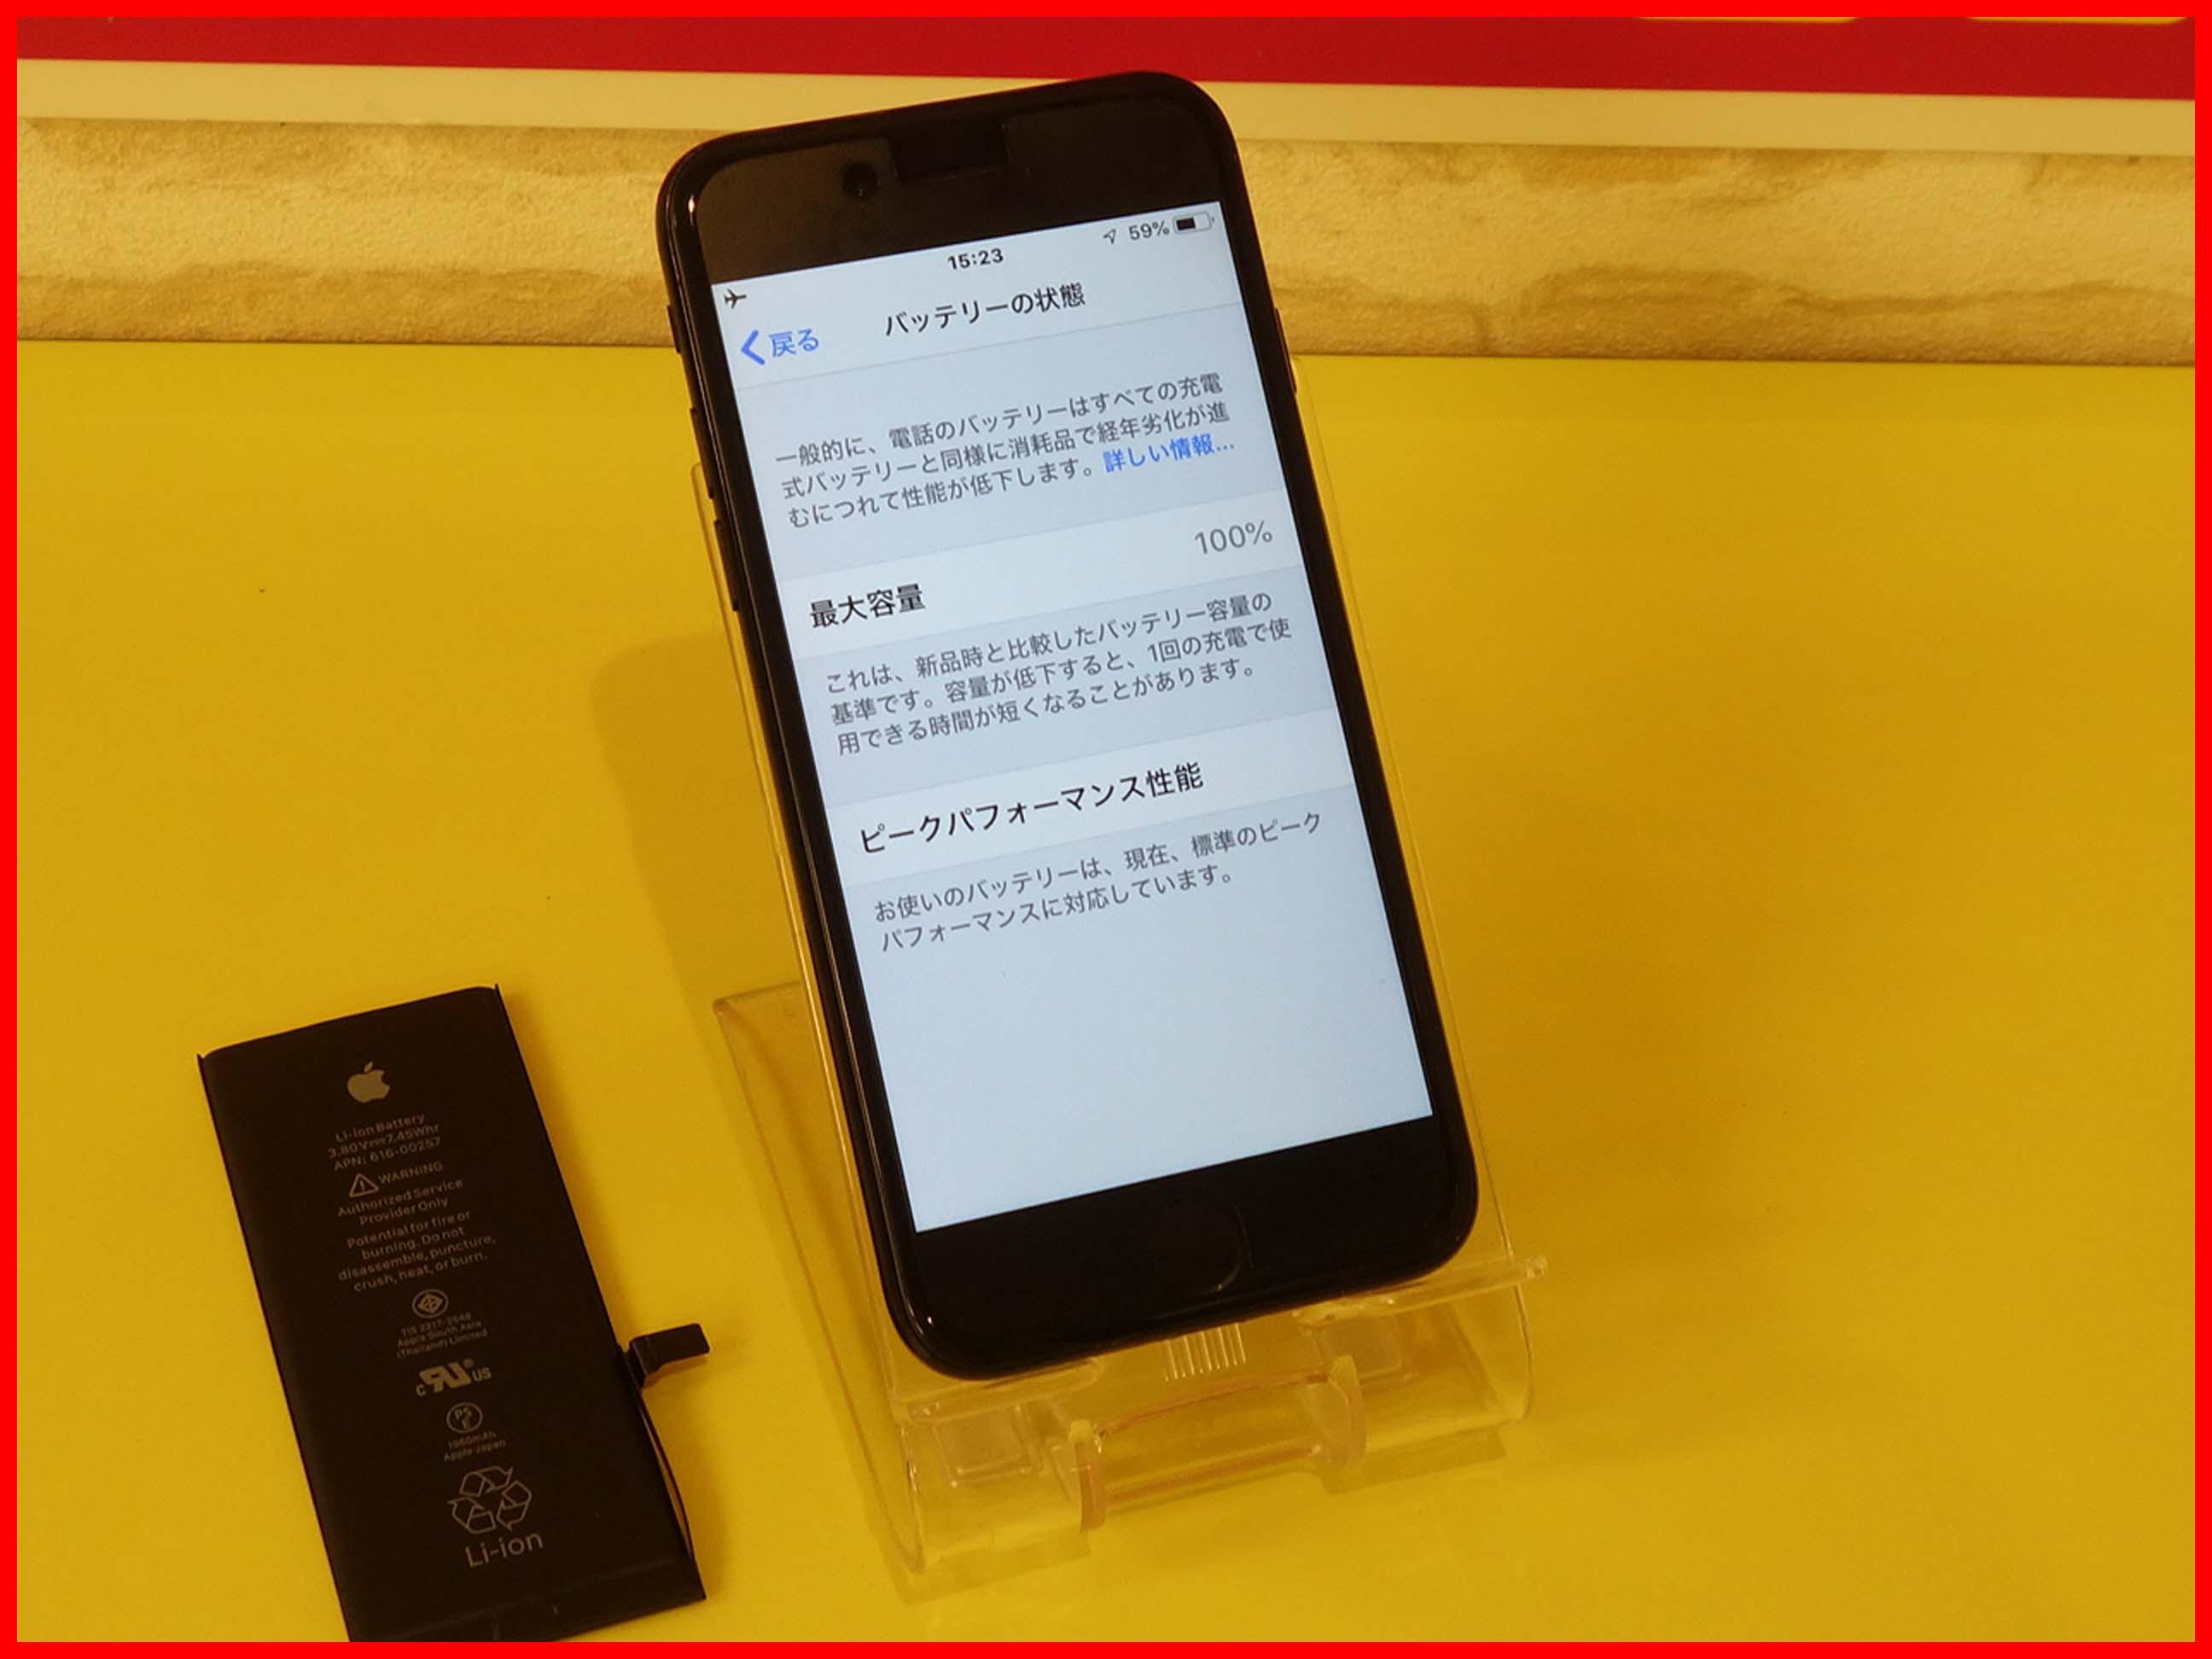 iPhone7のバッテリー交換修理で土岐市からご来店!アイフォン修理のクイック名古屋